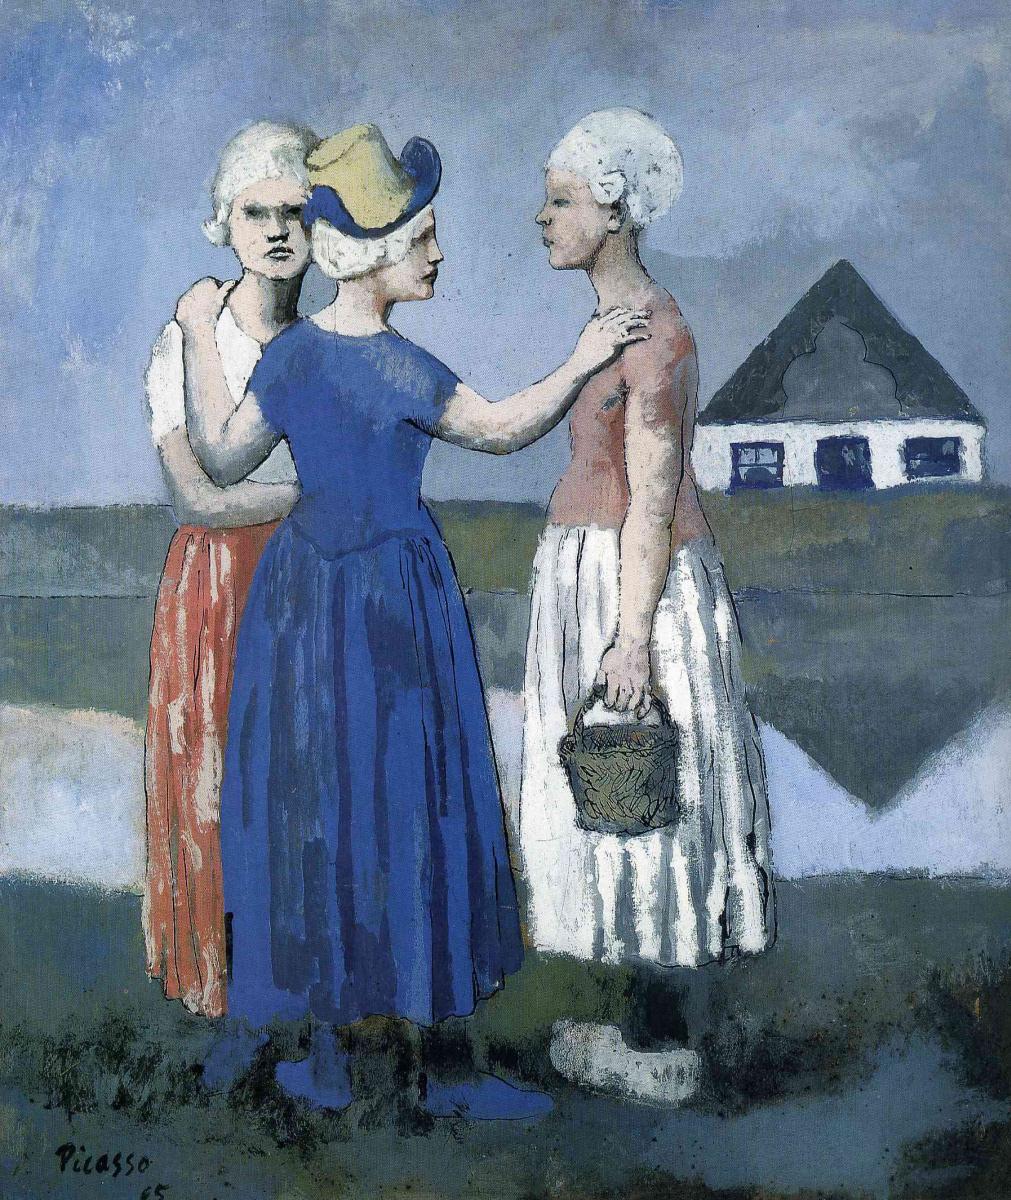 Пабло Пикассо. Три голландки